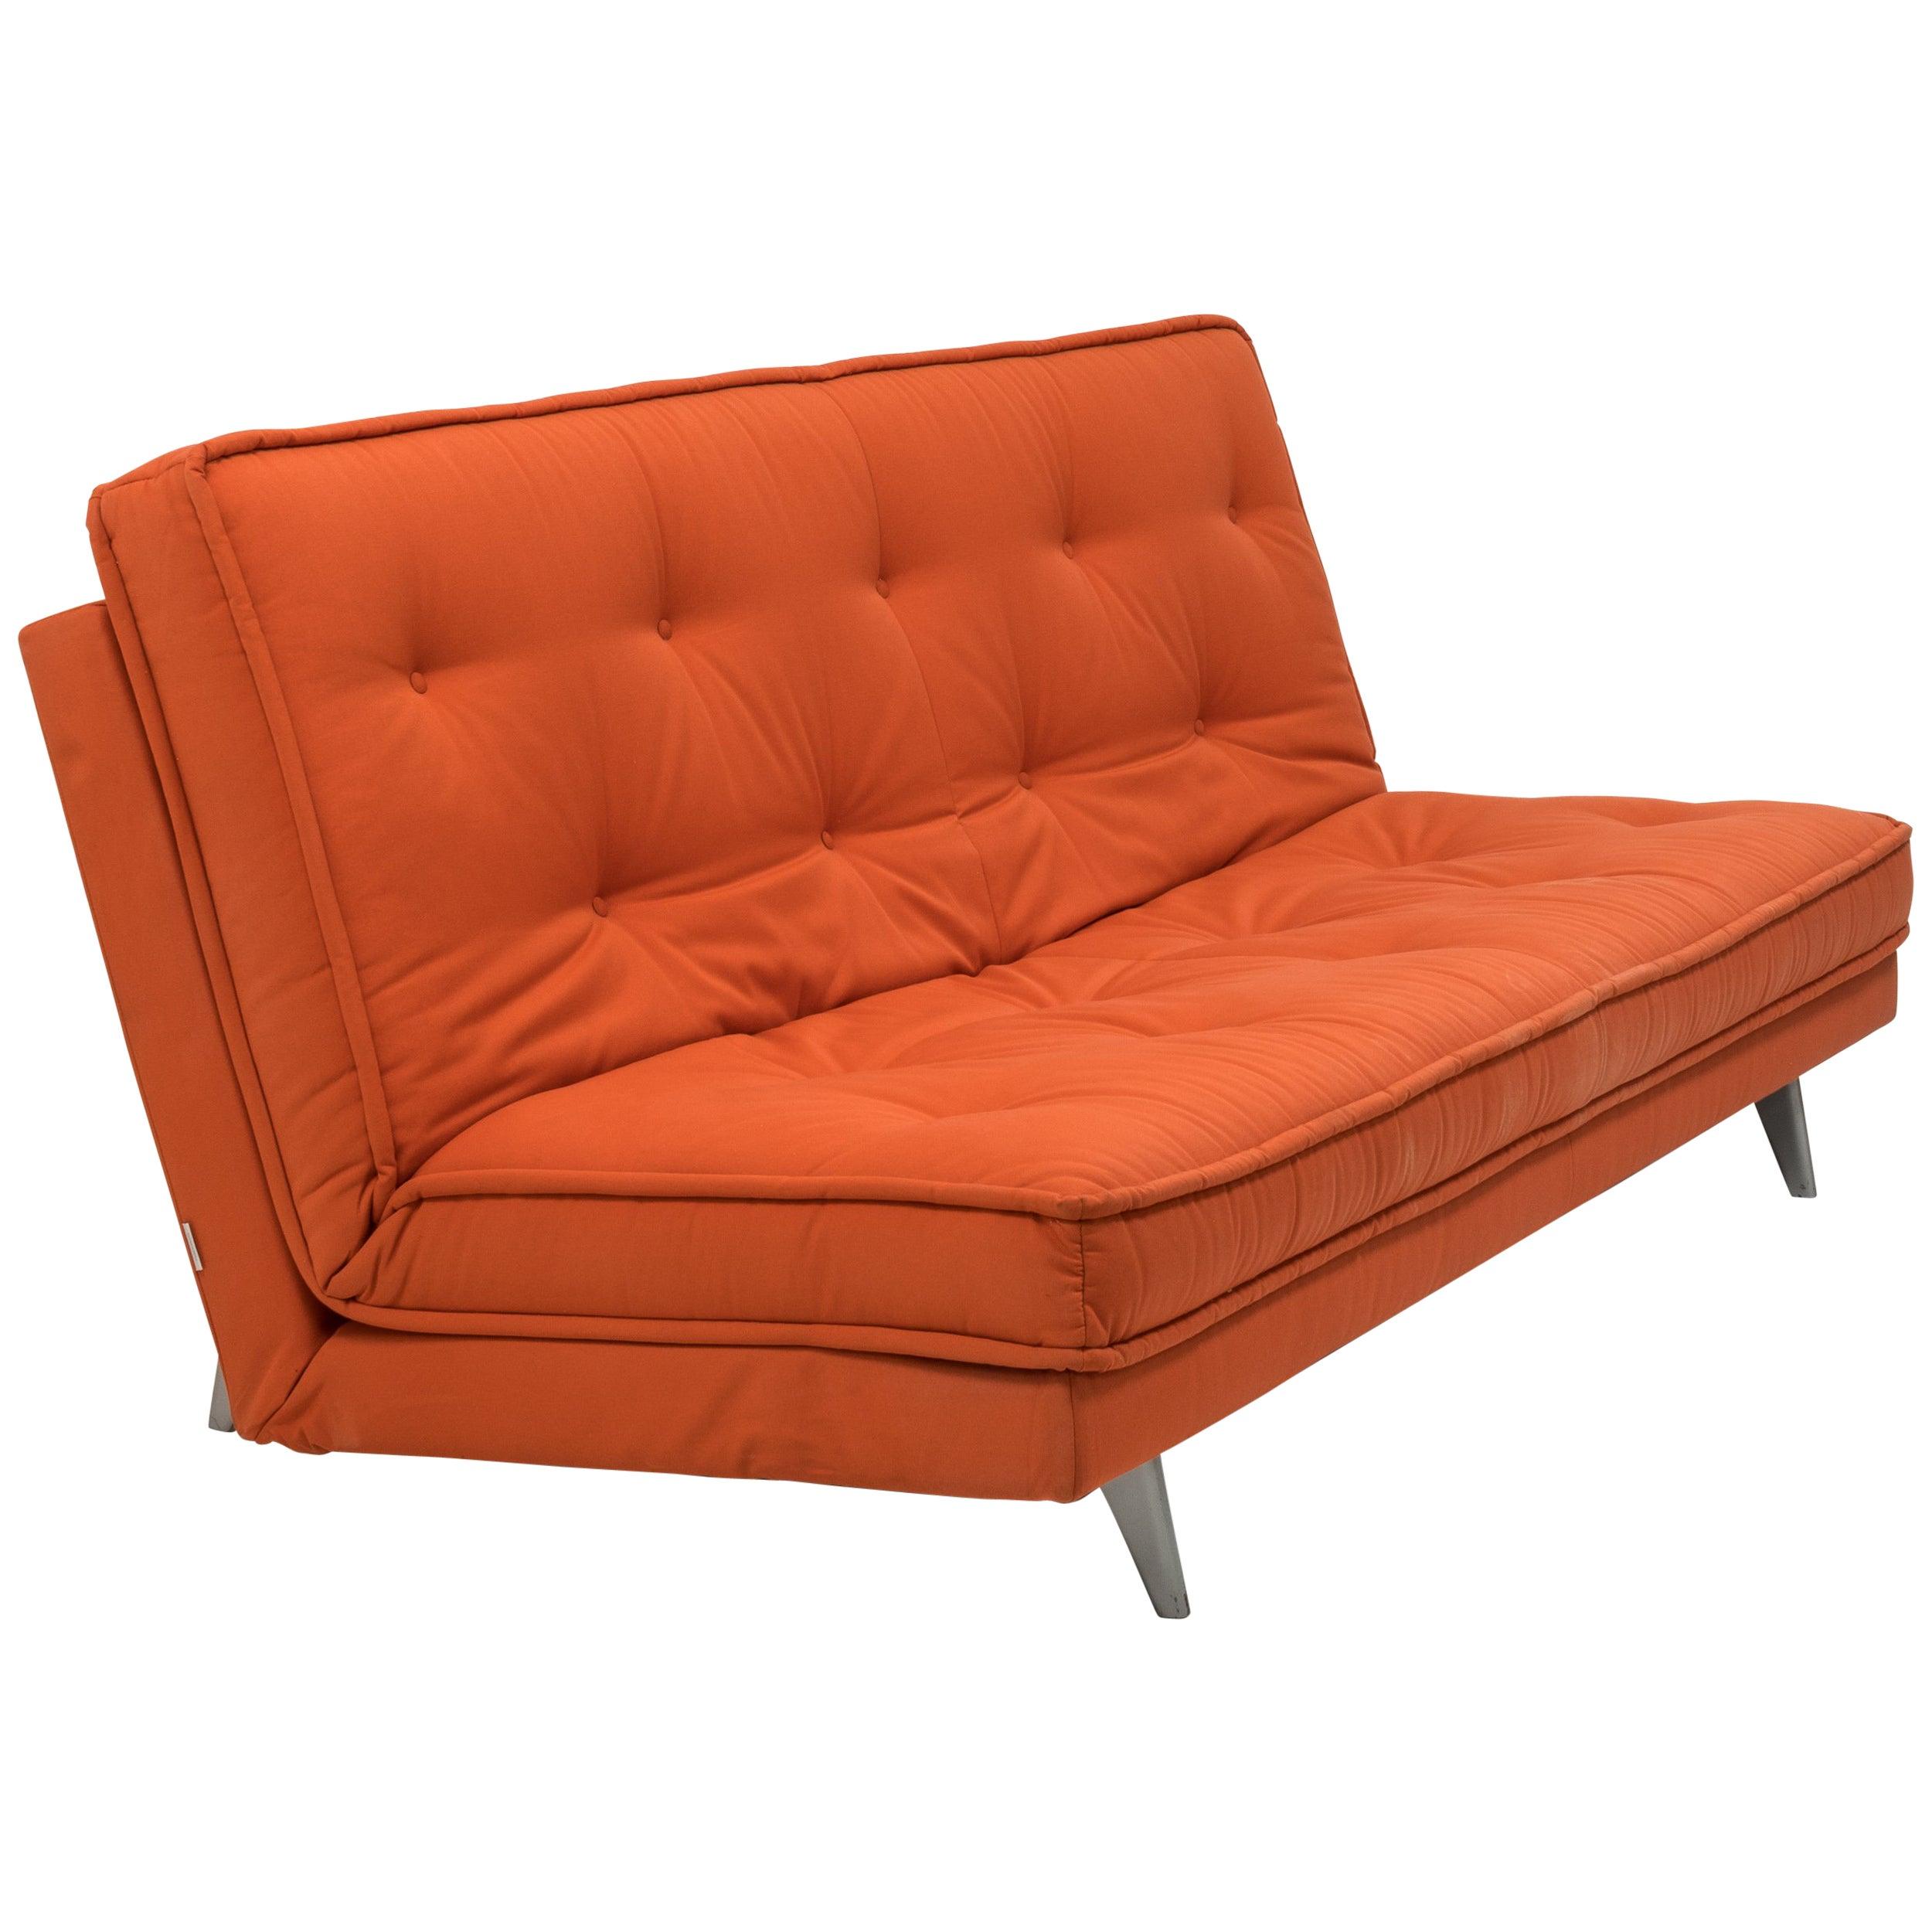 nomade express red sofa